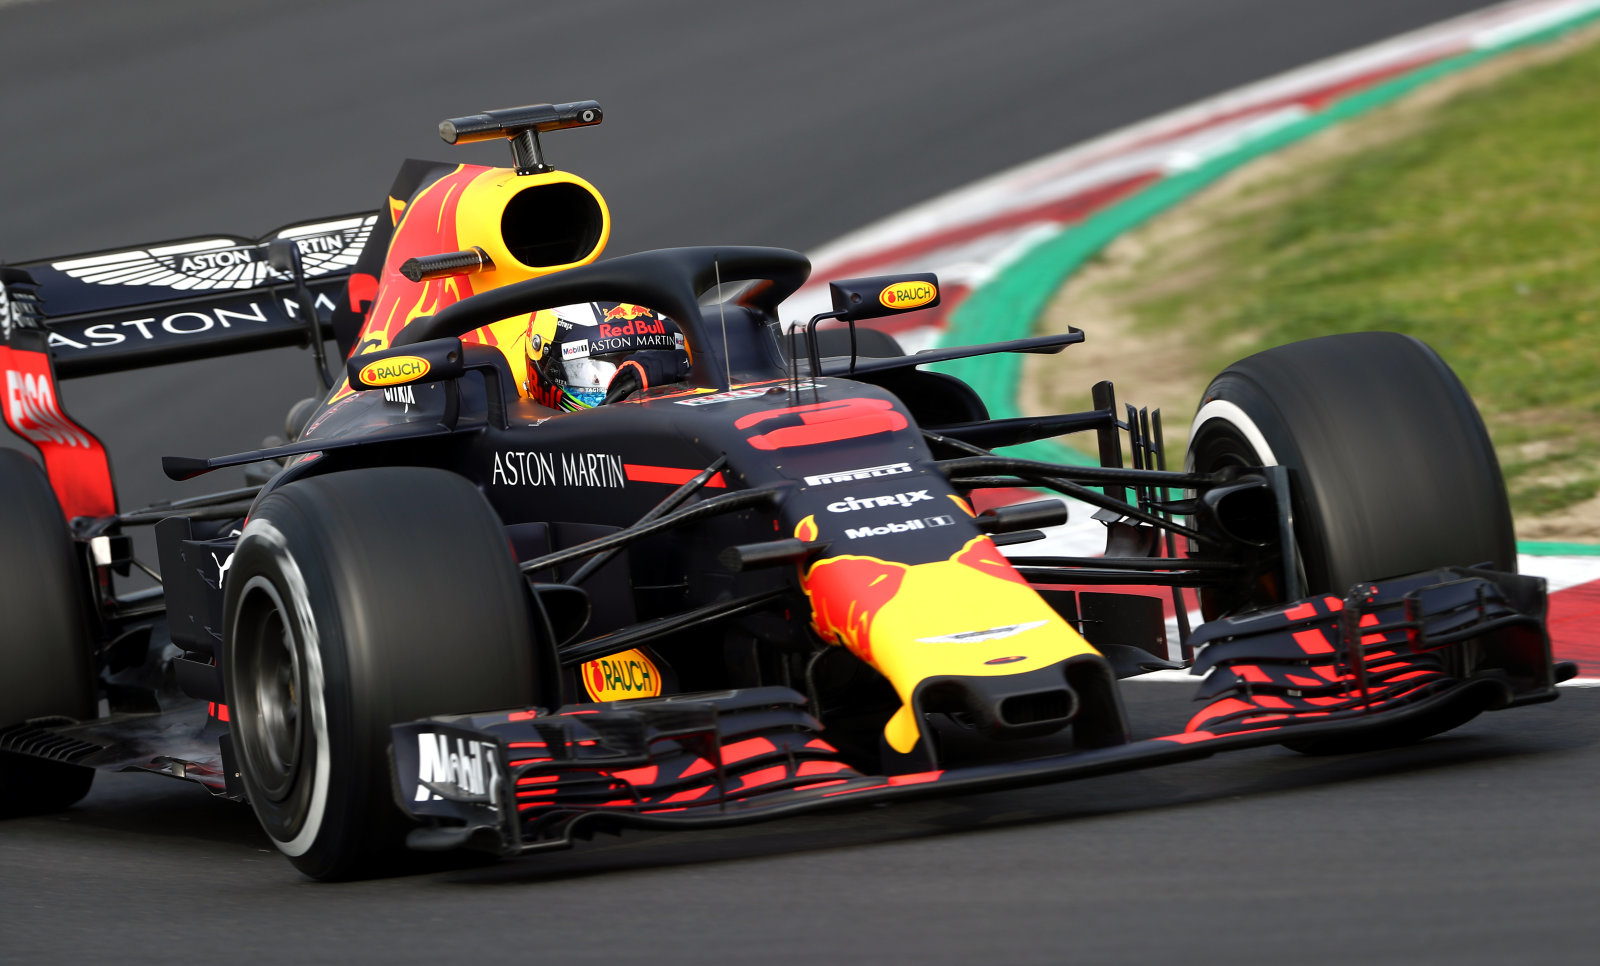 Red Bull's Daniel Ricciardo during day one of pre-season testing at the Circuit de Barcelona-Catalunya, Barcelona.